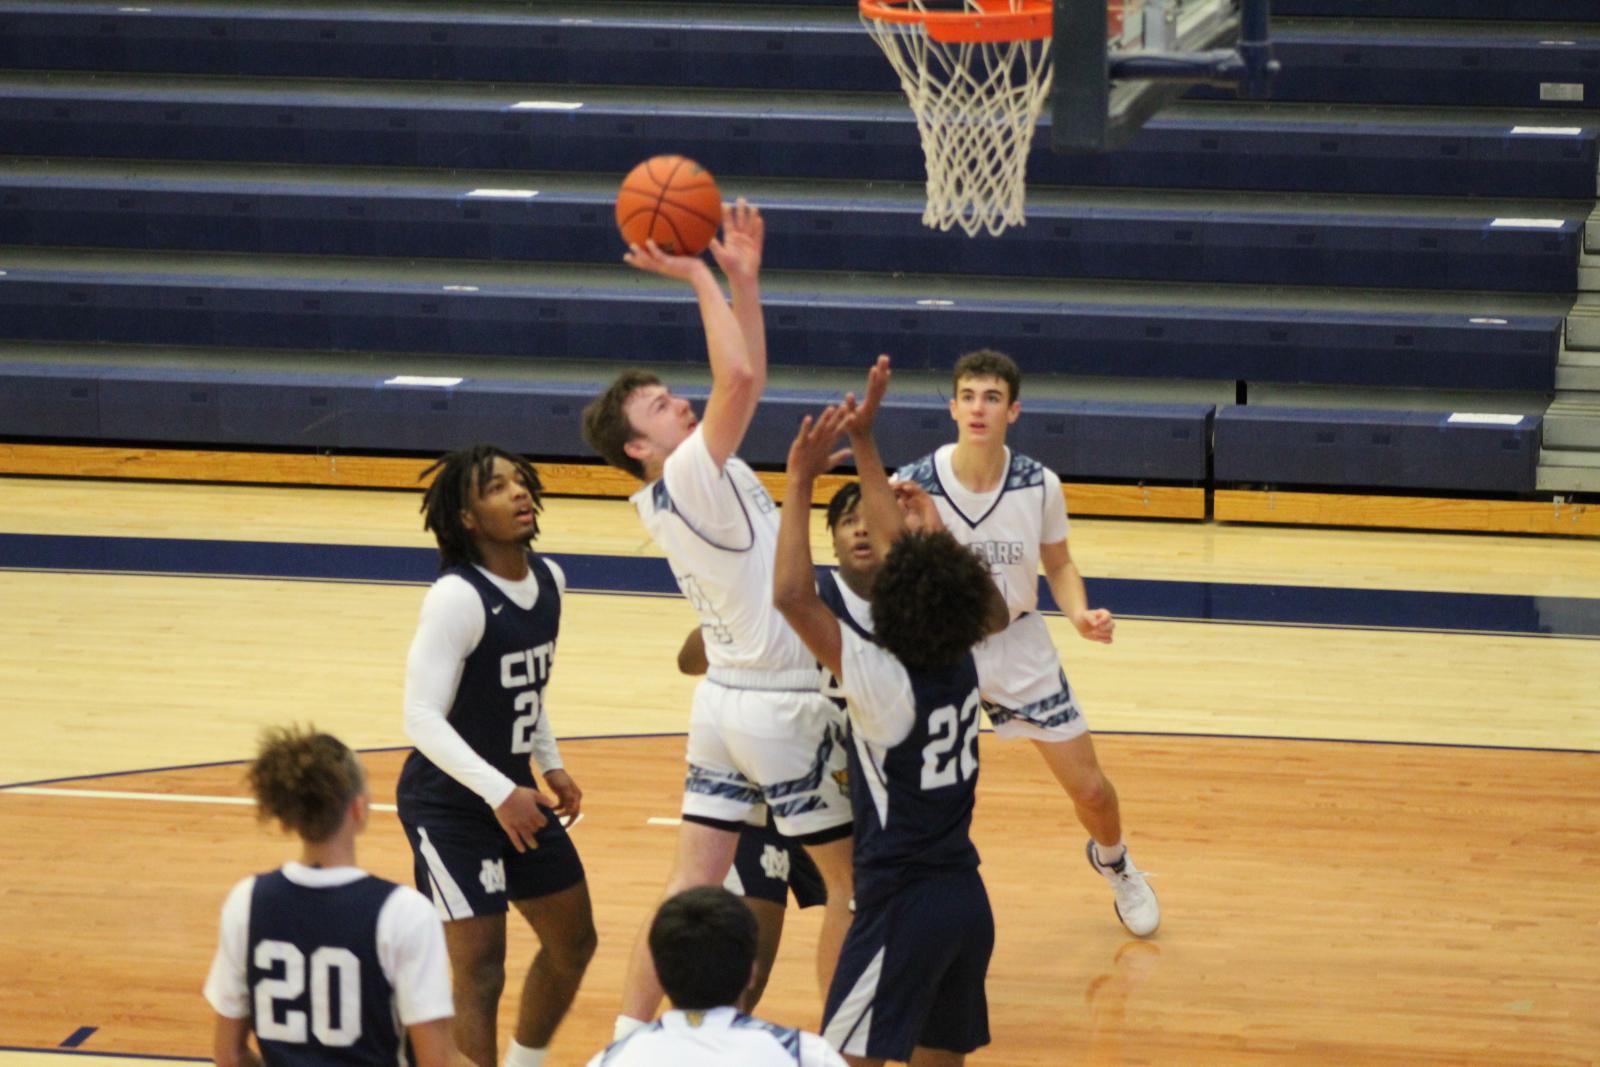 Boys Freshman Basketball vs. Michigan City 12/12/20  (Photo Gallery)